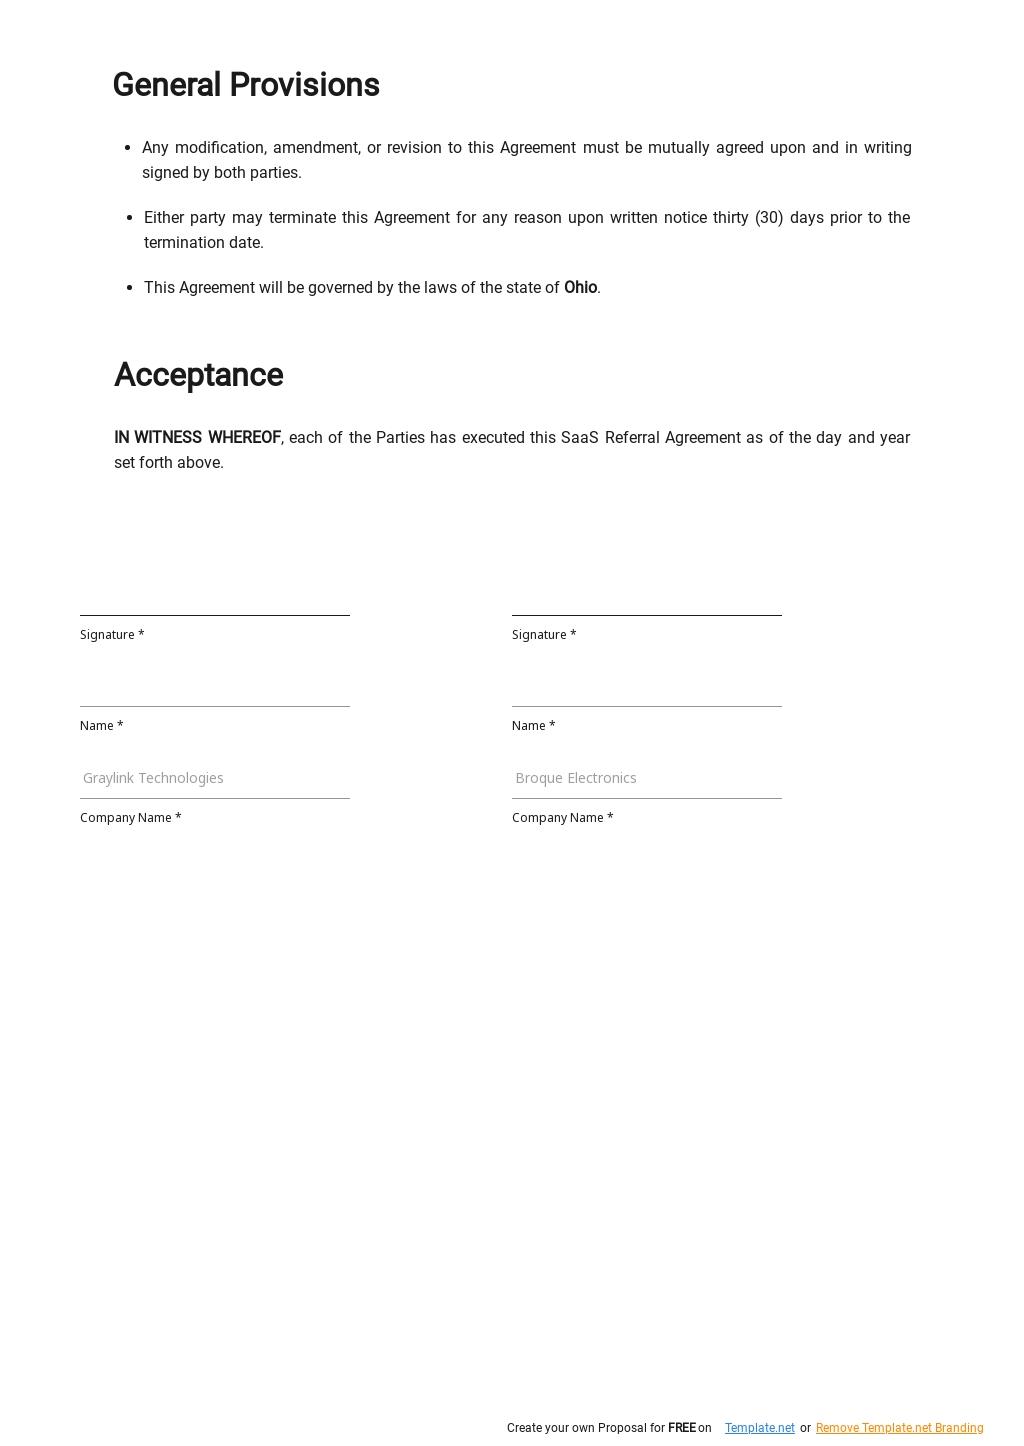 SaaS Referral Agreement Template 2.jpe